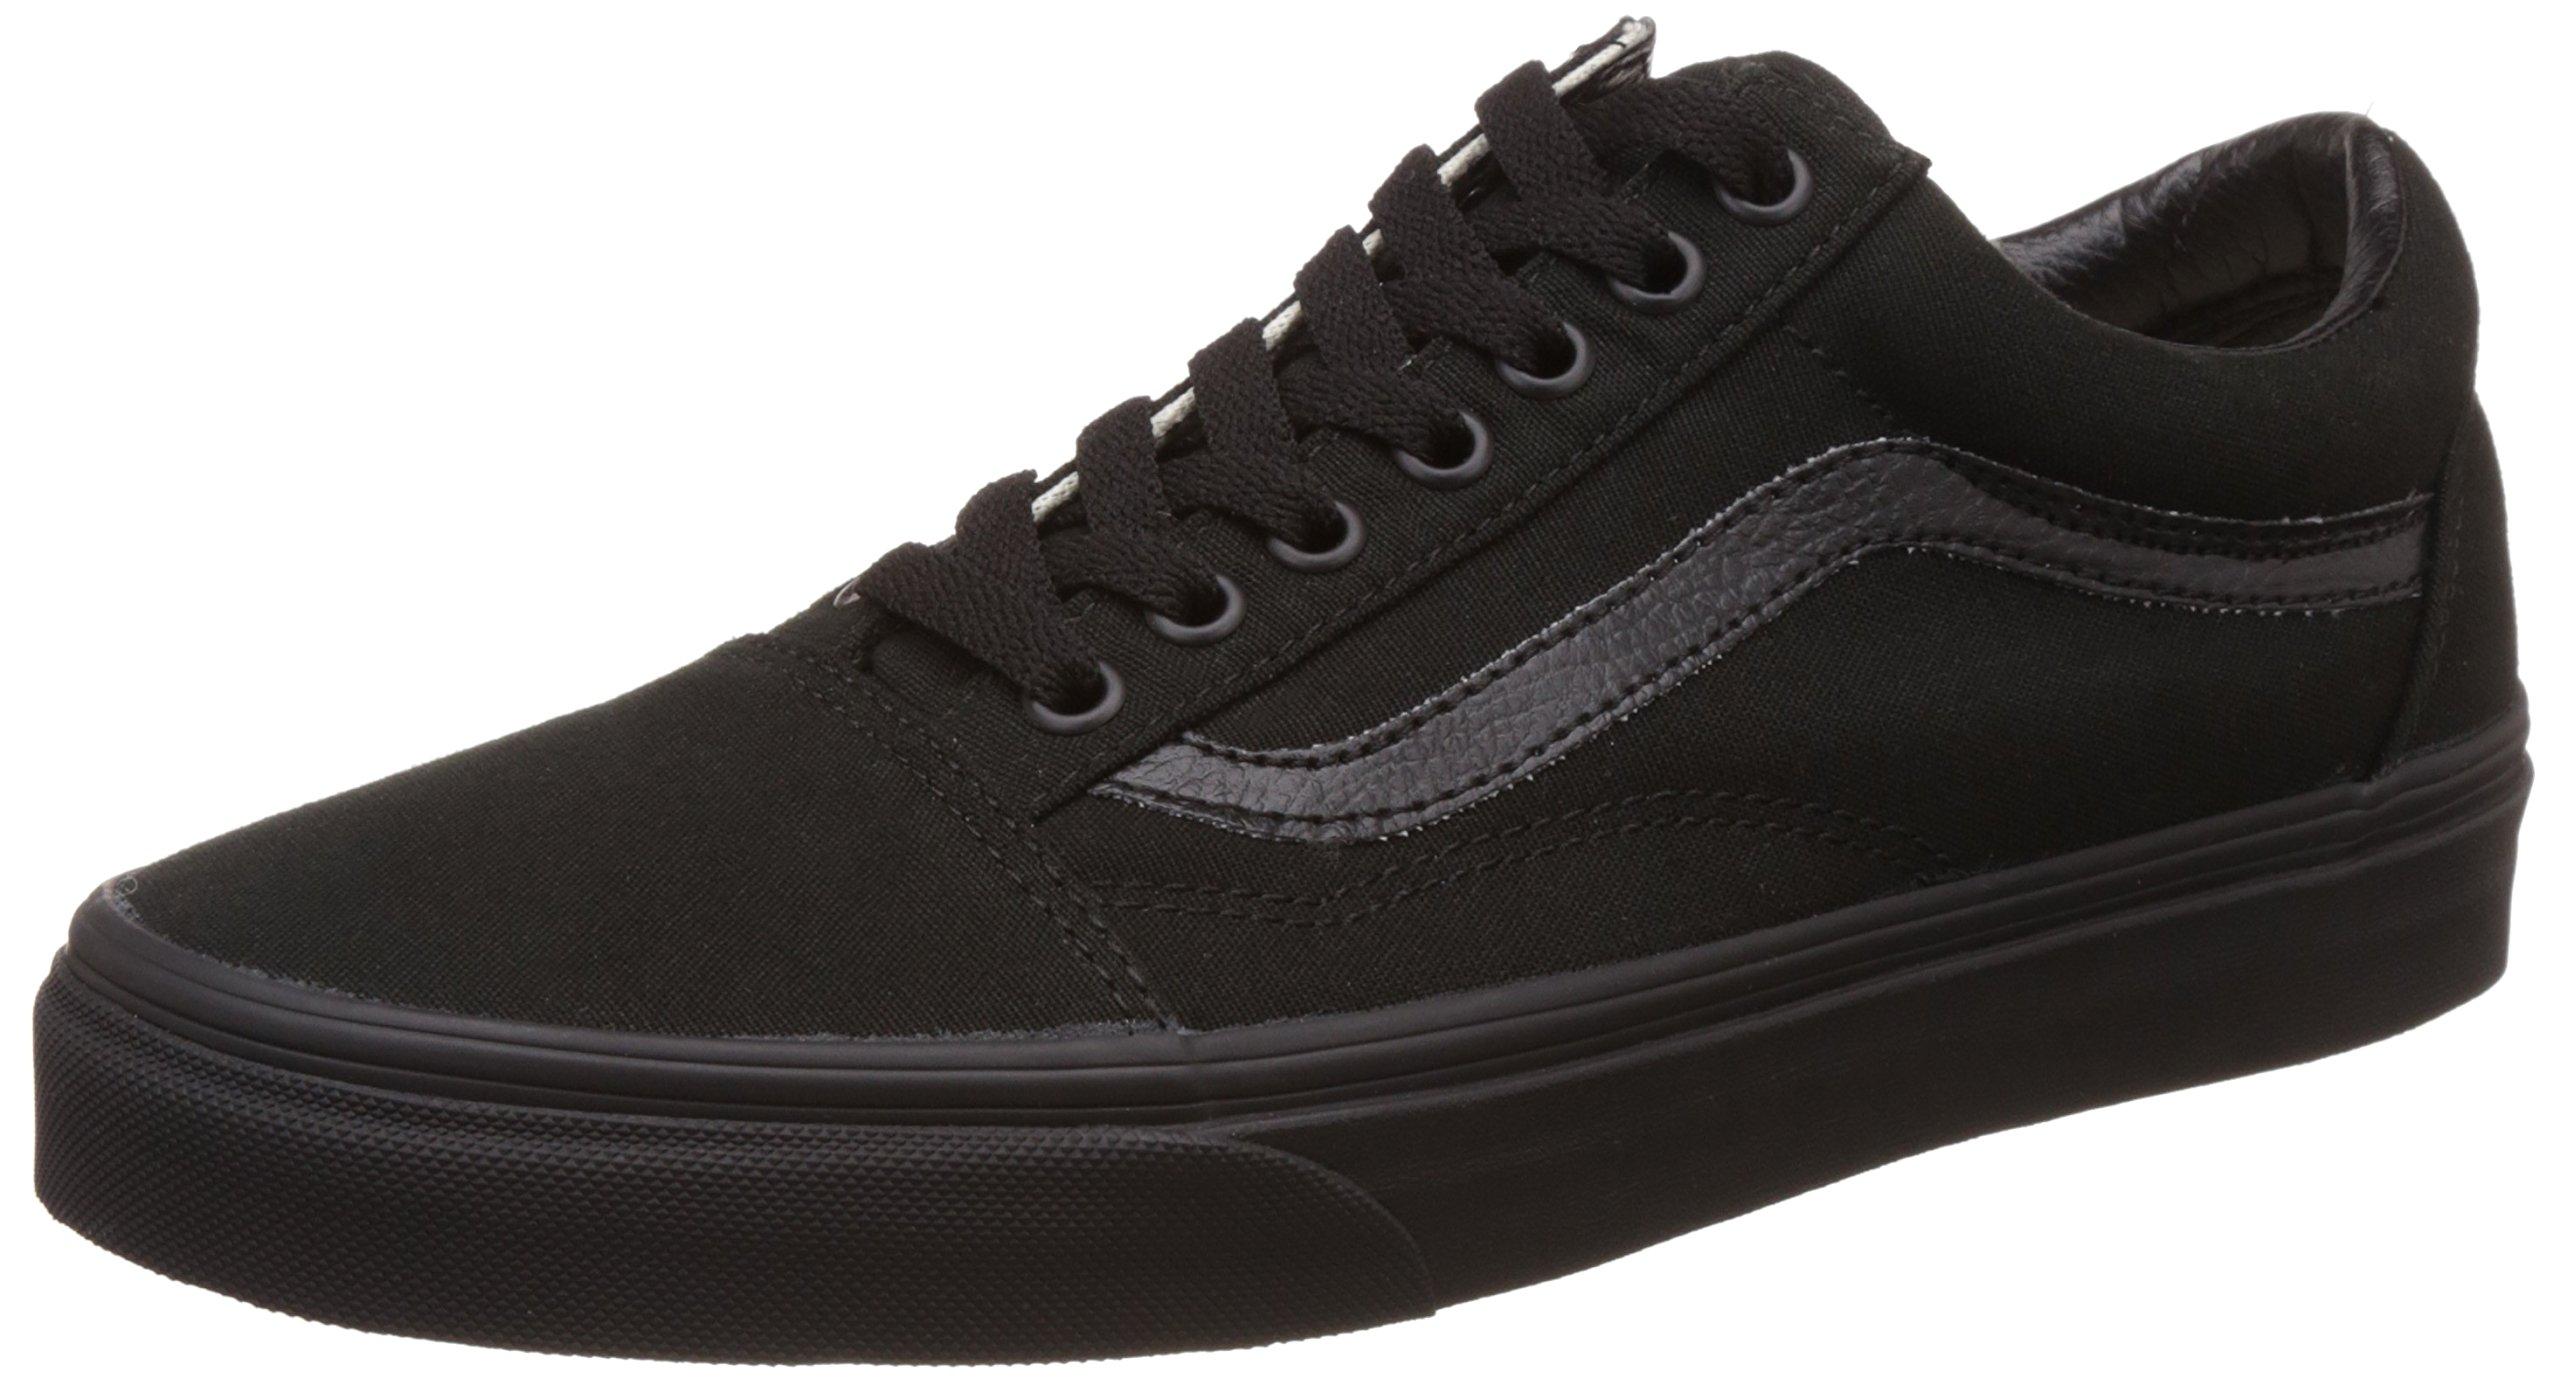 80a6ced1de Vans Unisex Old Skool Black Leather Sneakers – 8 UK India (42 EU ...